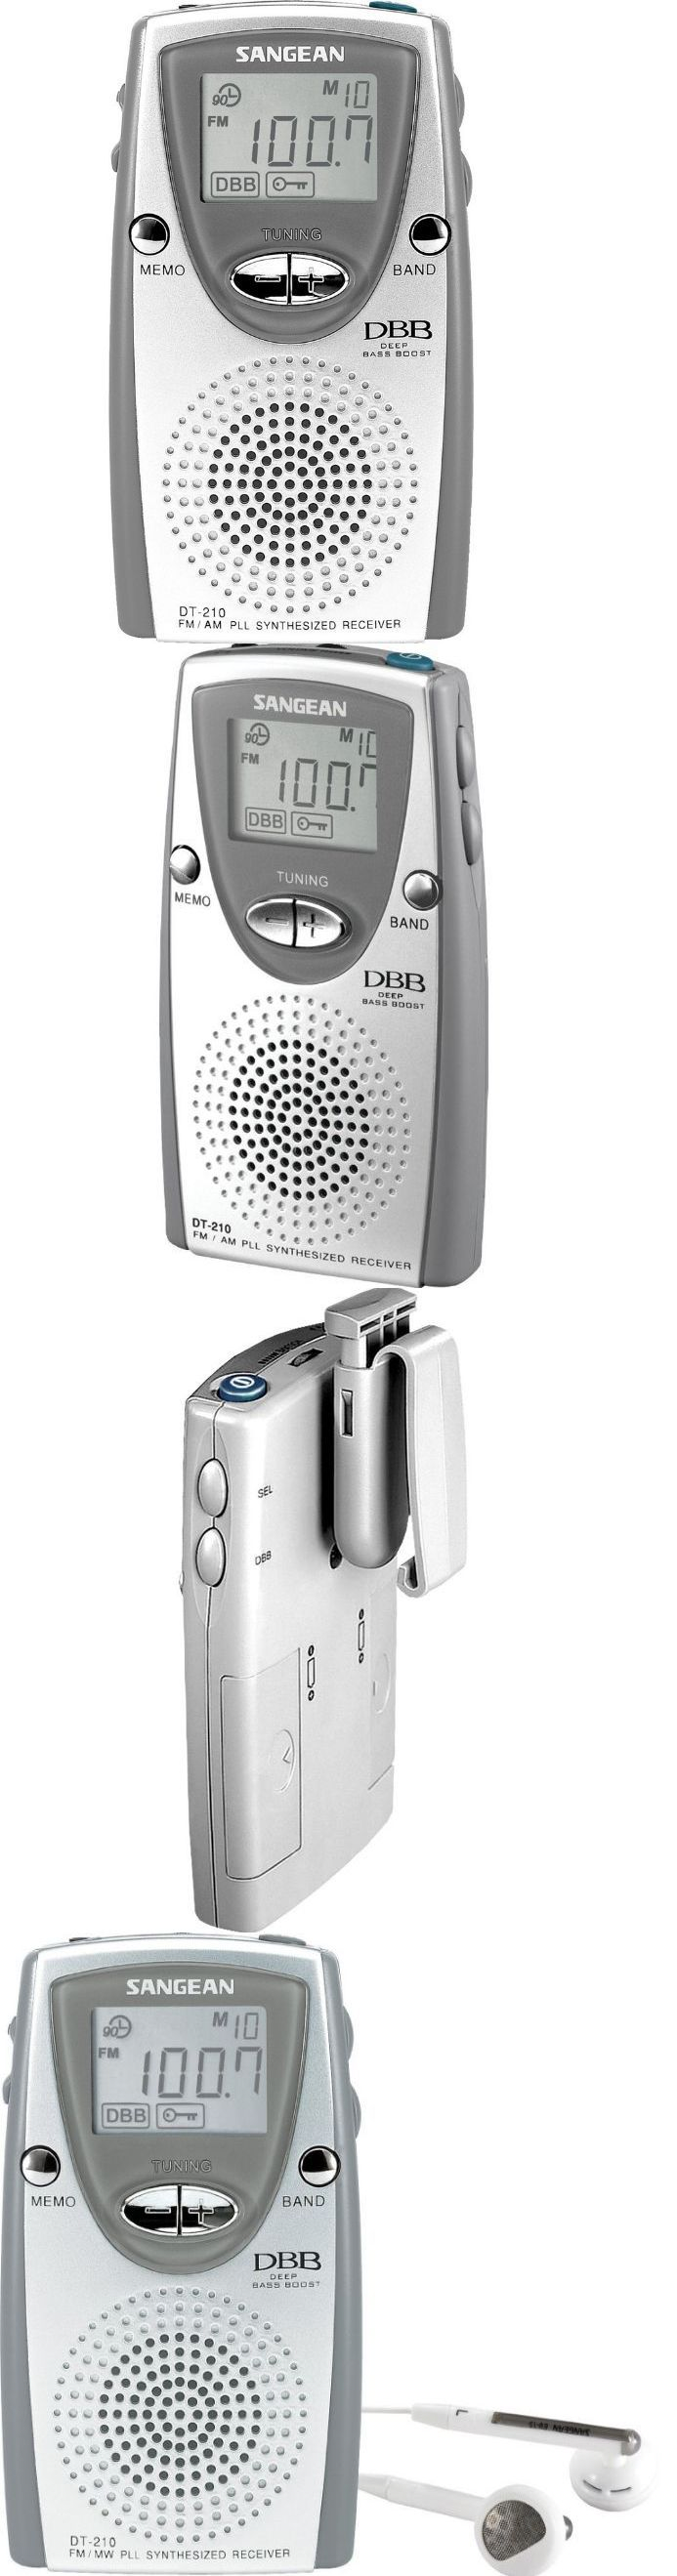 Portable AM FM Radios: Best Portable Radio Sangean Pocket Small Am Fm Stereo Speaker Audio Mini Digital BUY IT NOW ONLY: $57.99